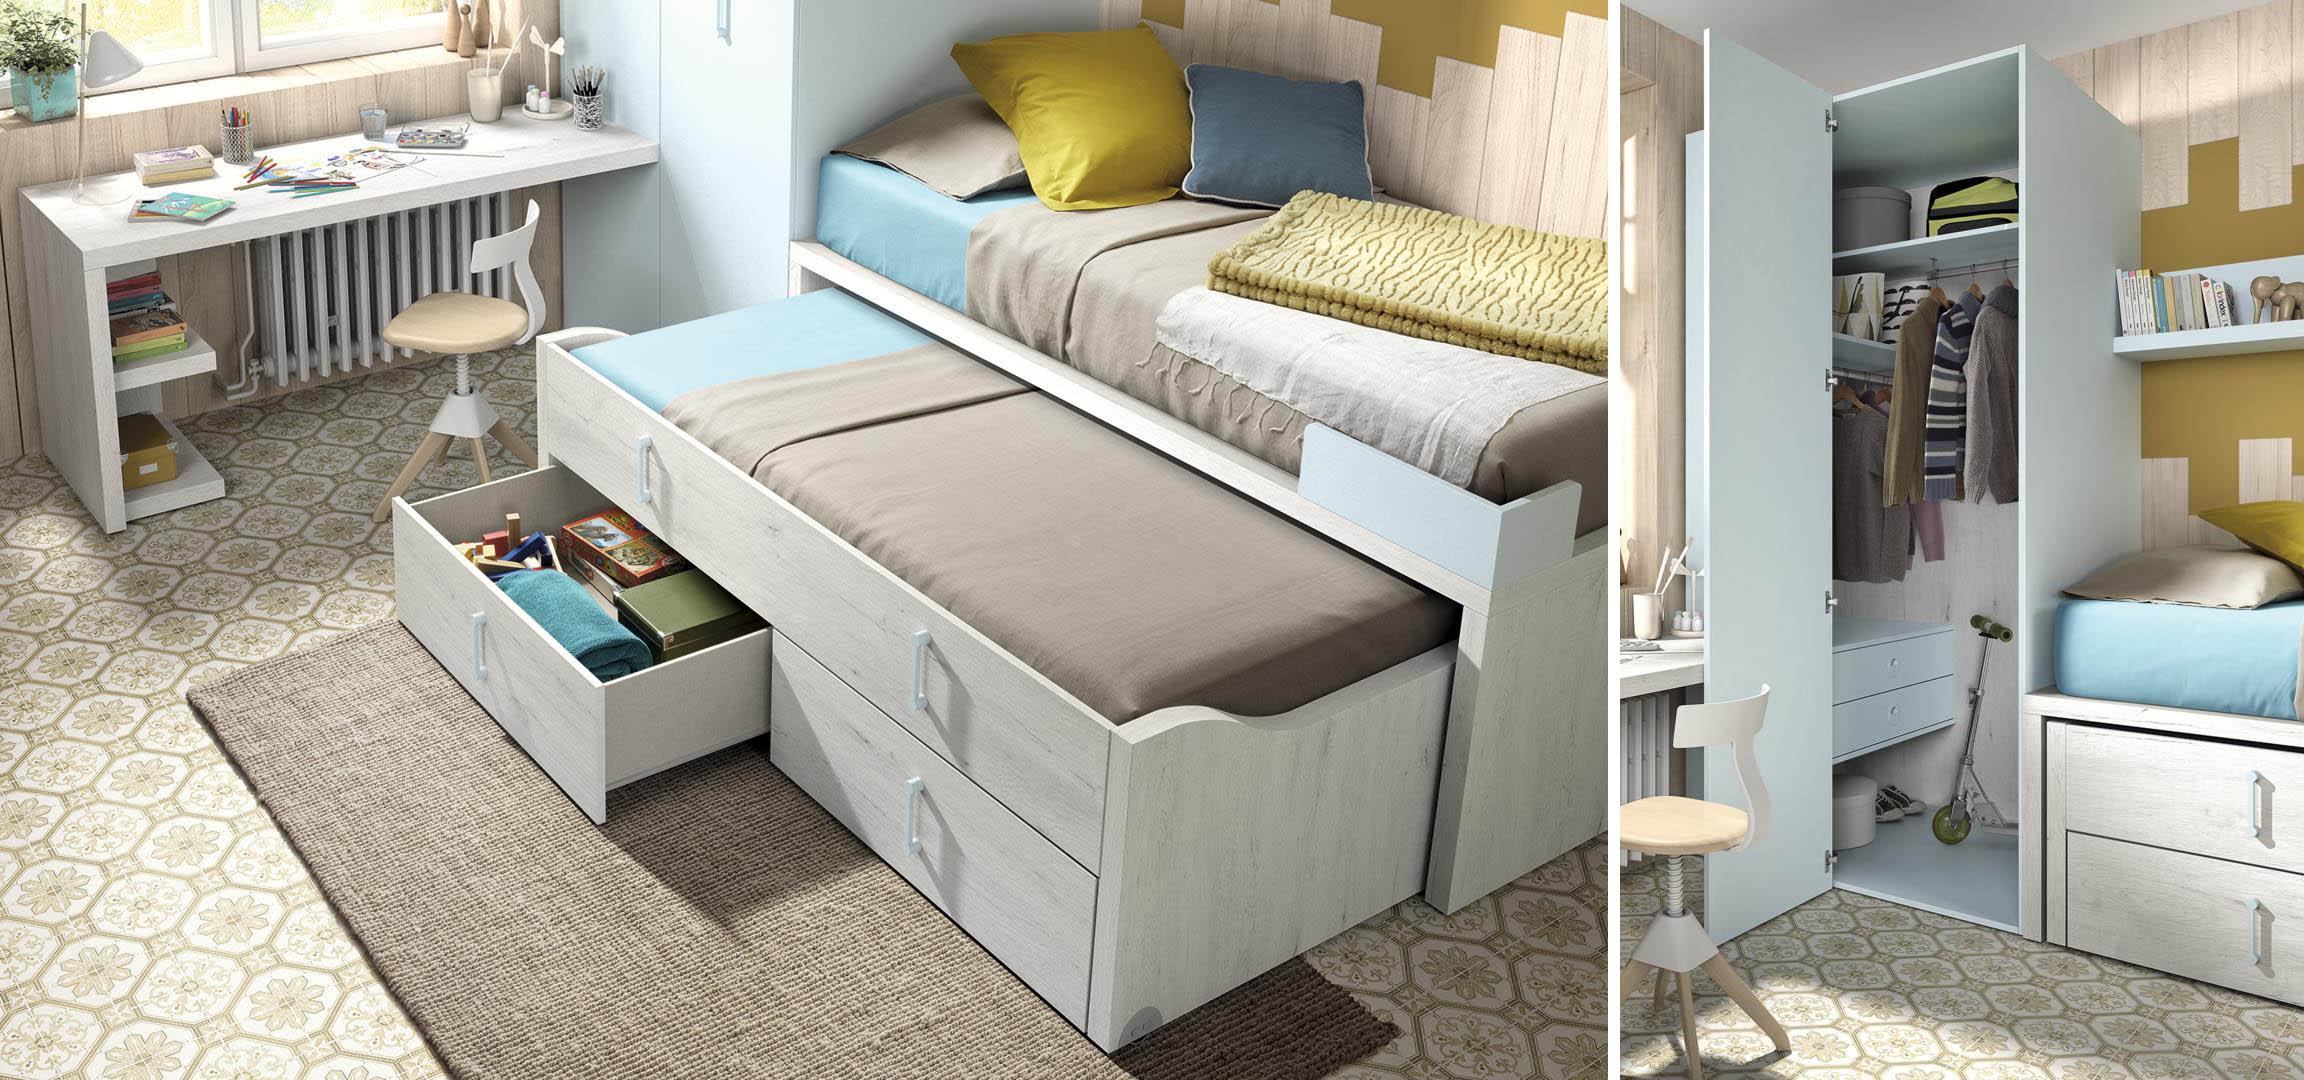 dormitorios juveniles (27)